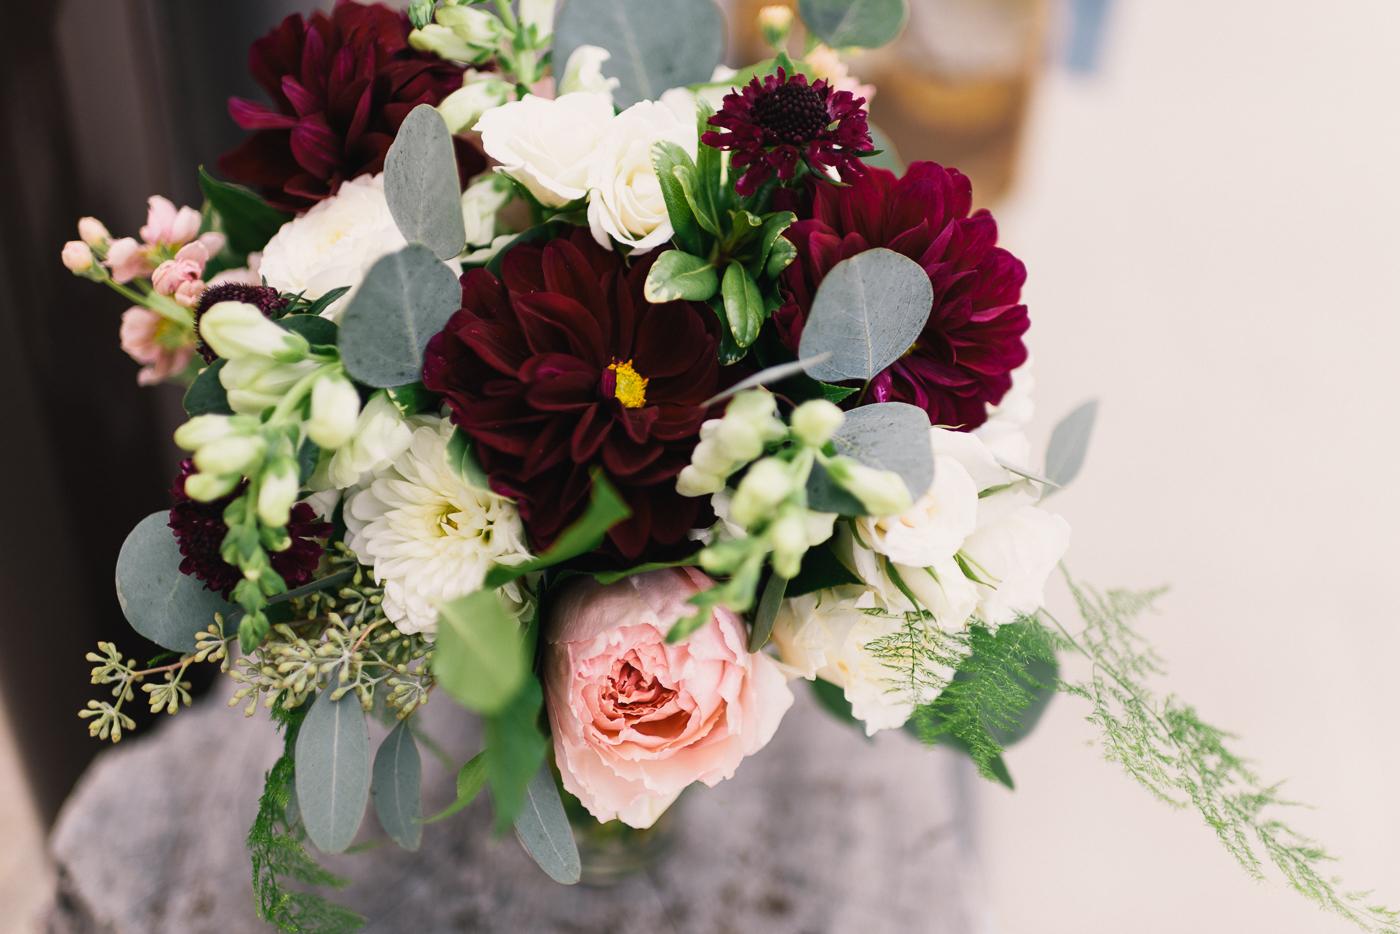 Wedding bouquet flowers pretty green red pink garden roses dahlias